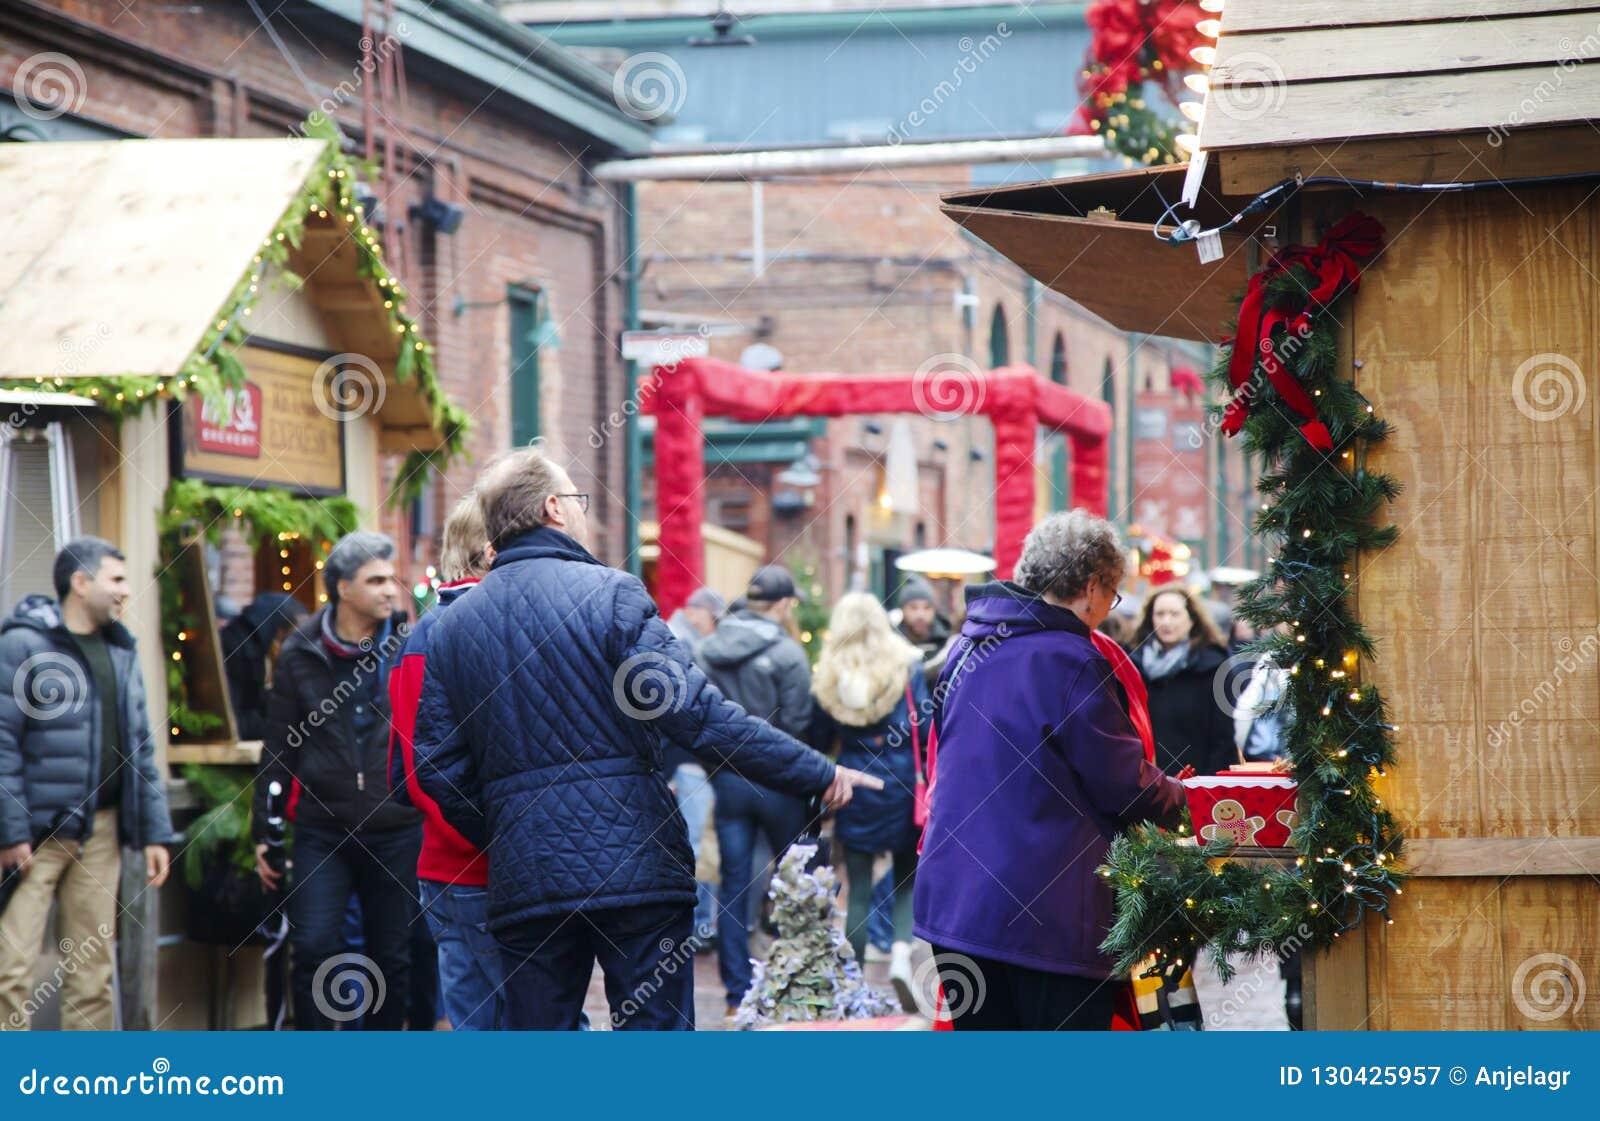 Christmas In Toronto Canada.Toronto Canada November 18 2017 People Visit Christmas